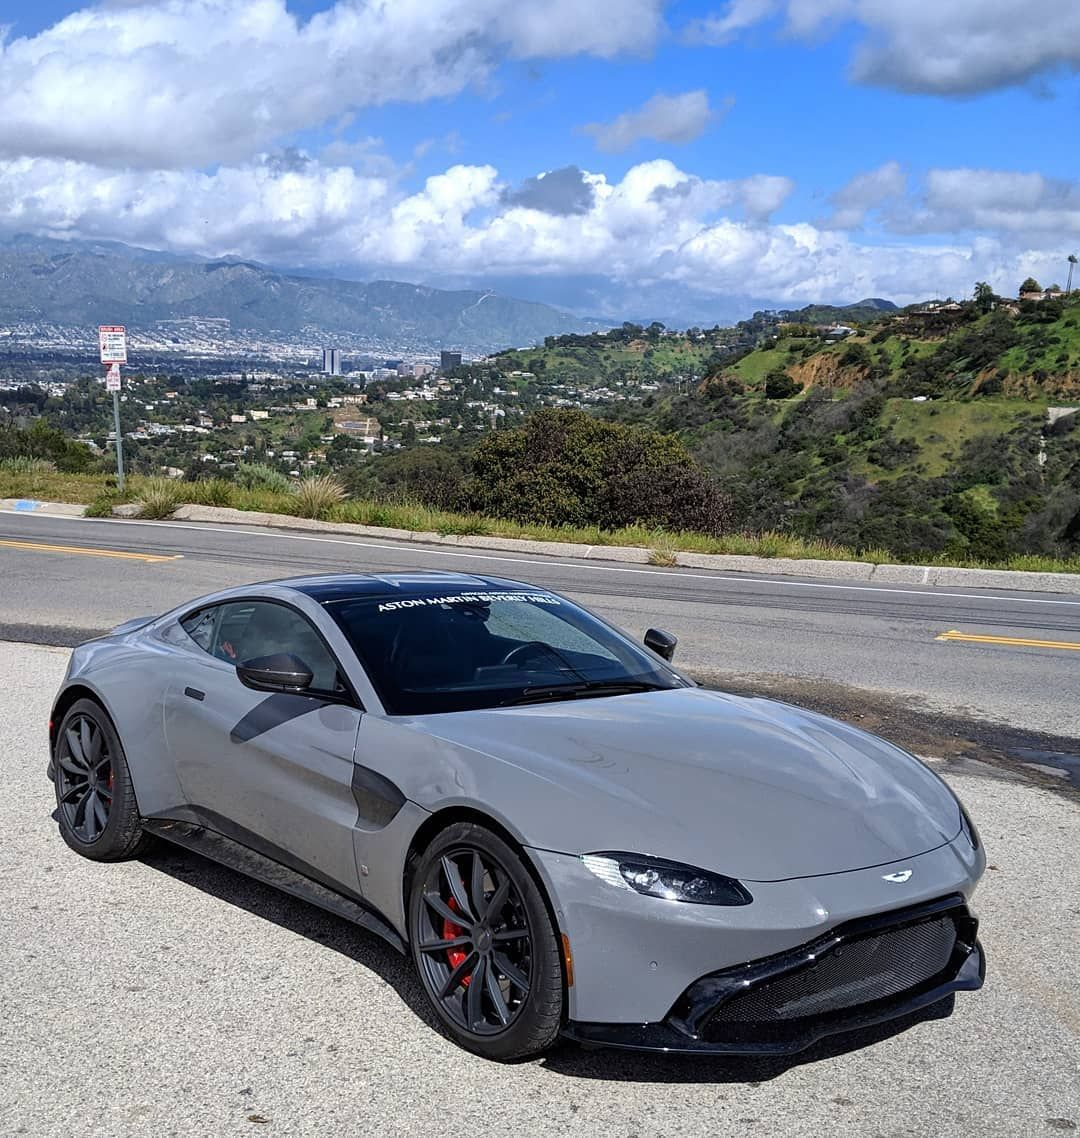 China Grey Aston Martin Vantage Aston Martin Vantage Aston Martin Aston Martin Cars